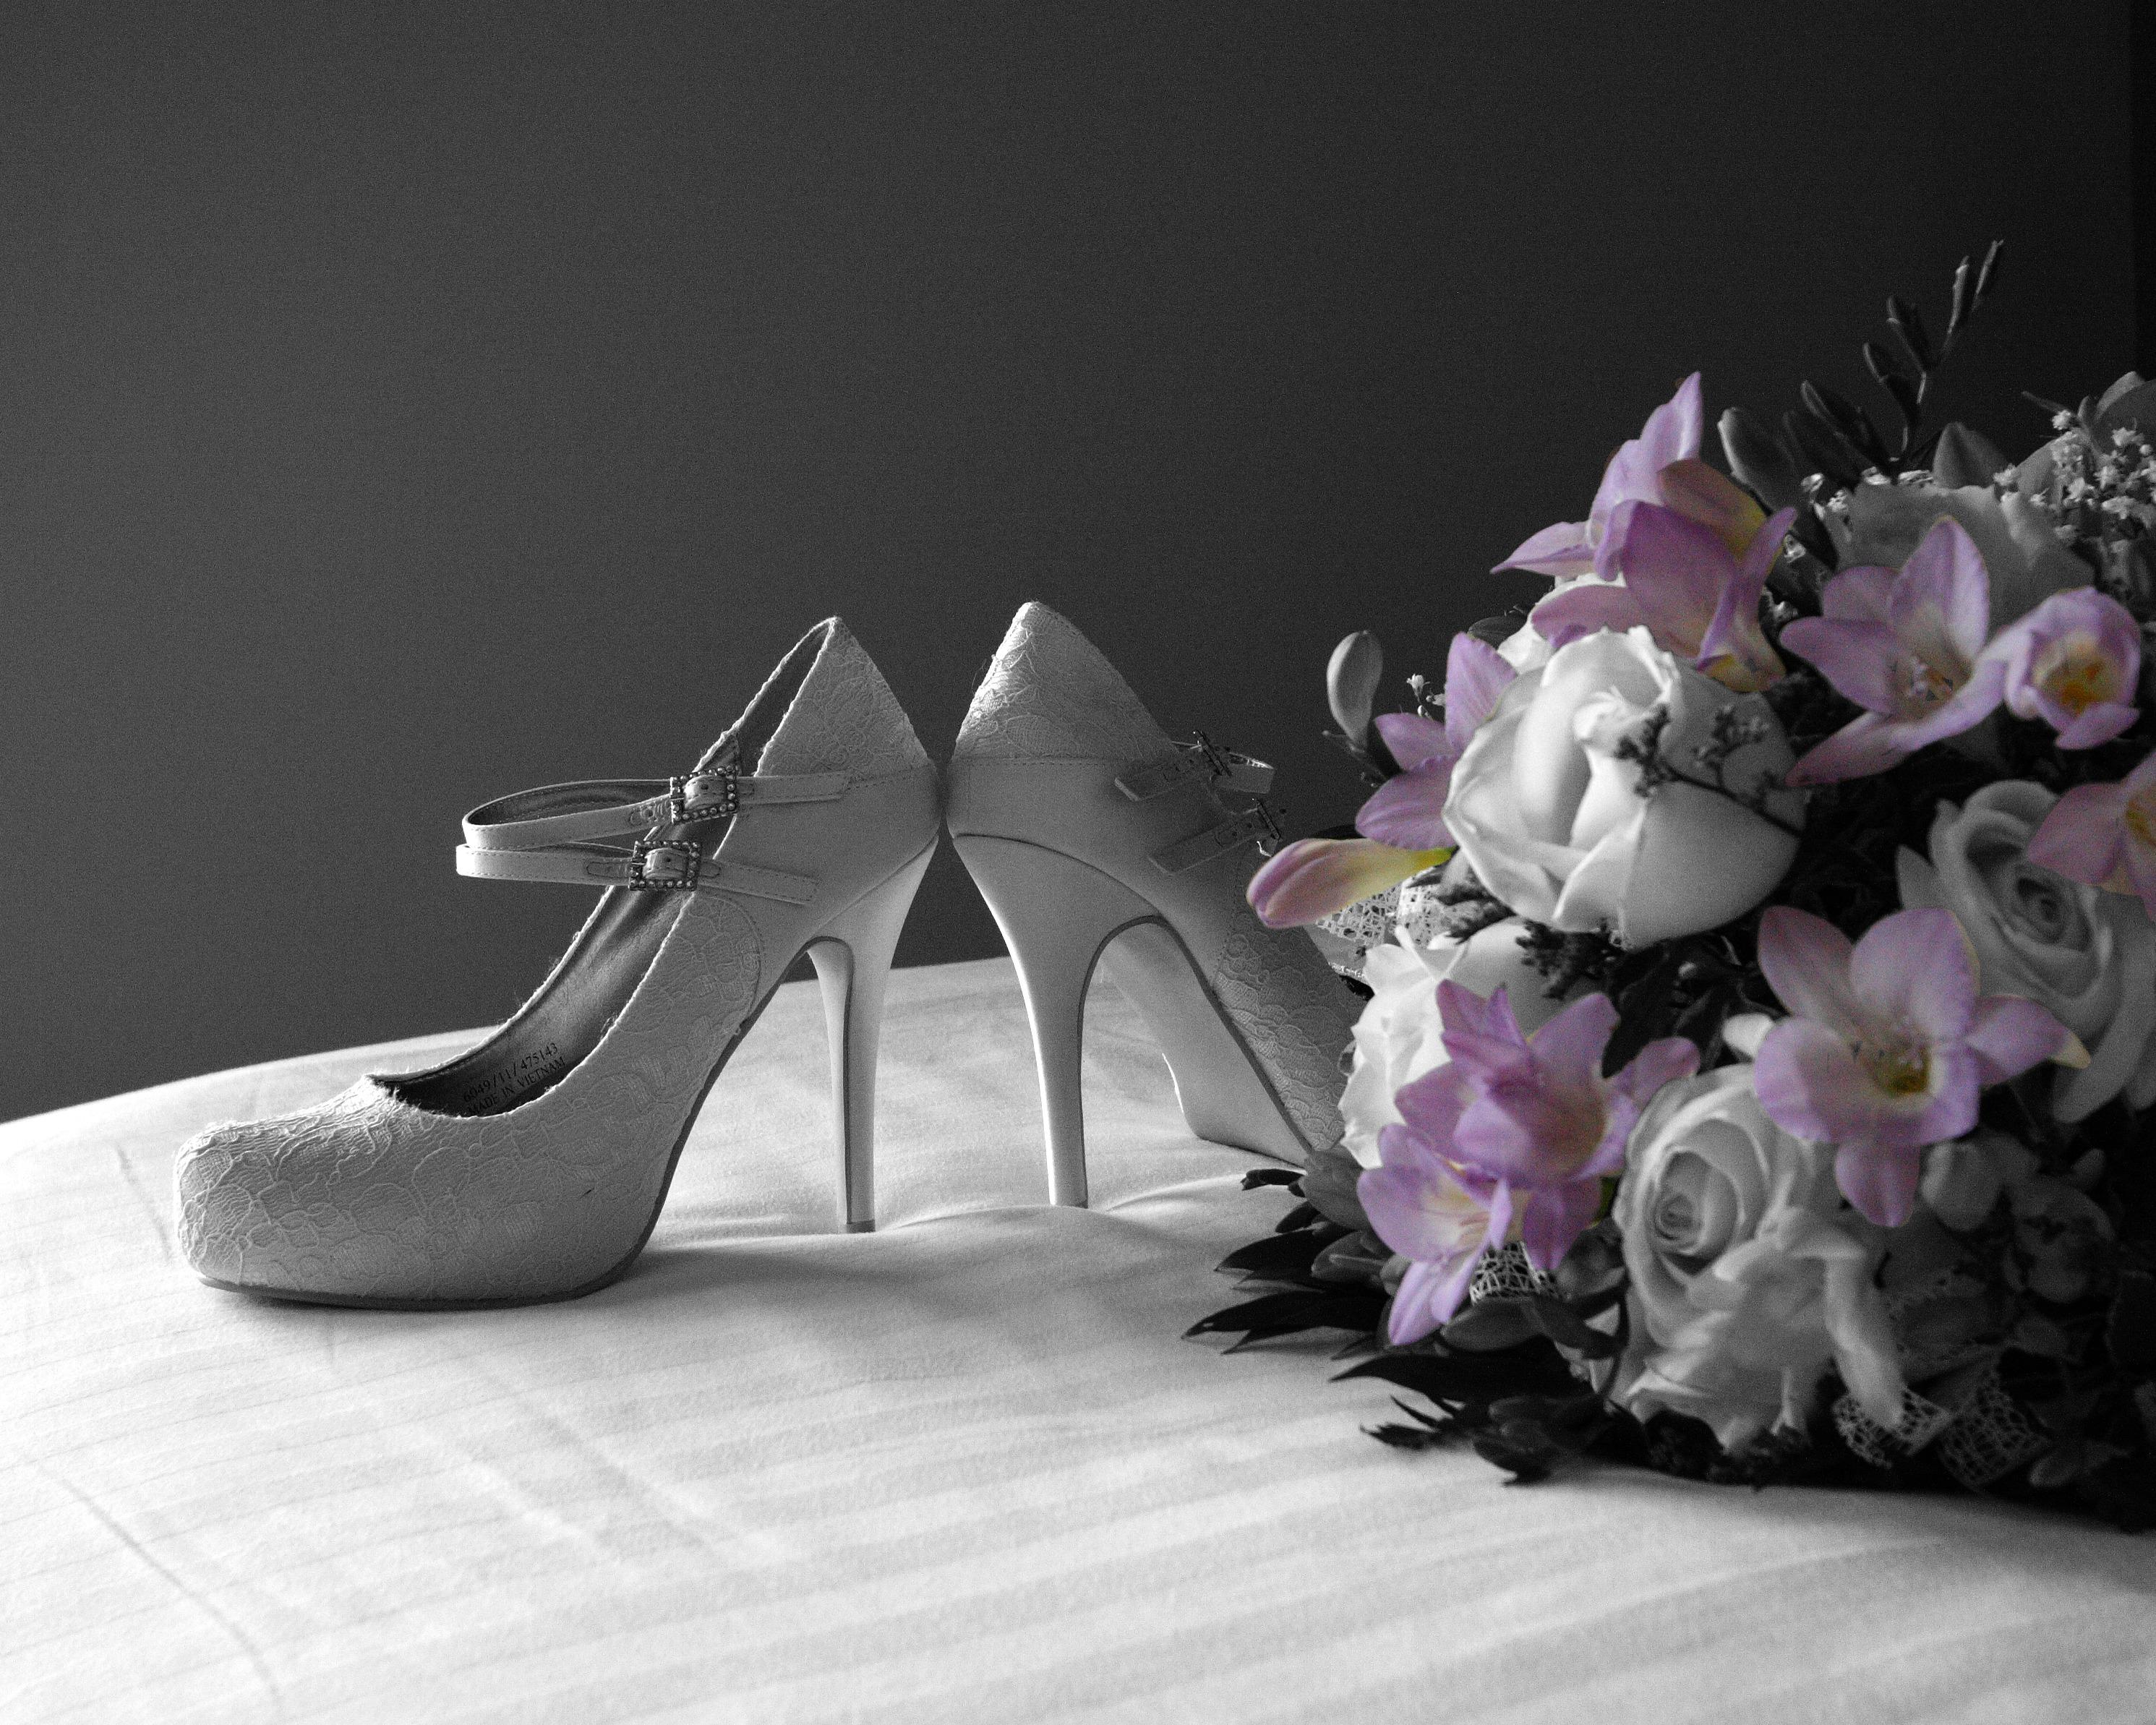 shoe-black-and-white-plant-white-flower-purple-1415937-pxhere.com